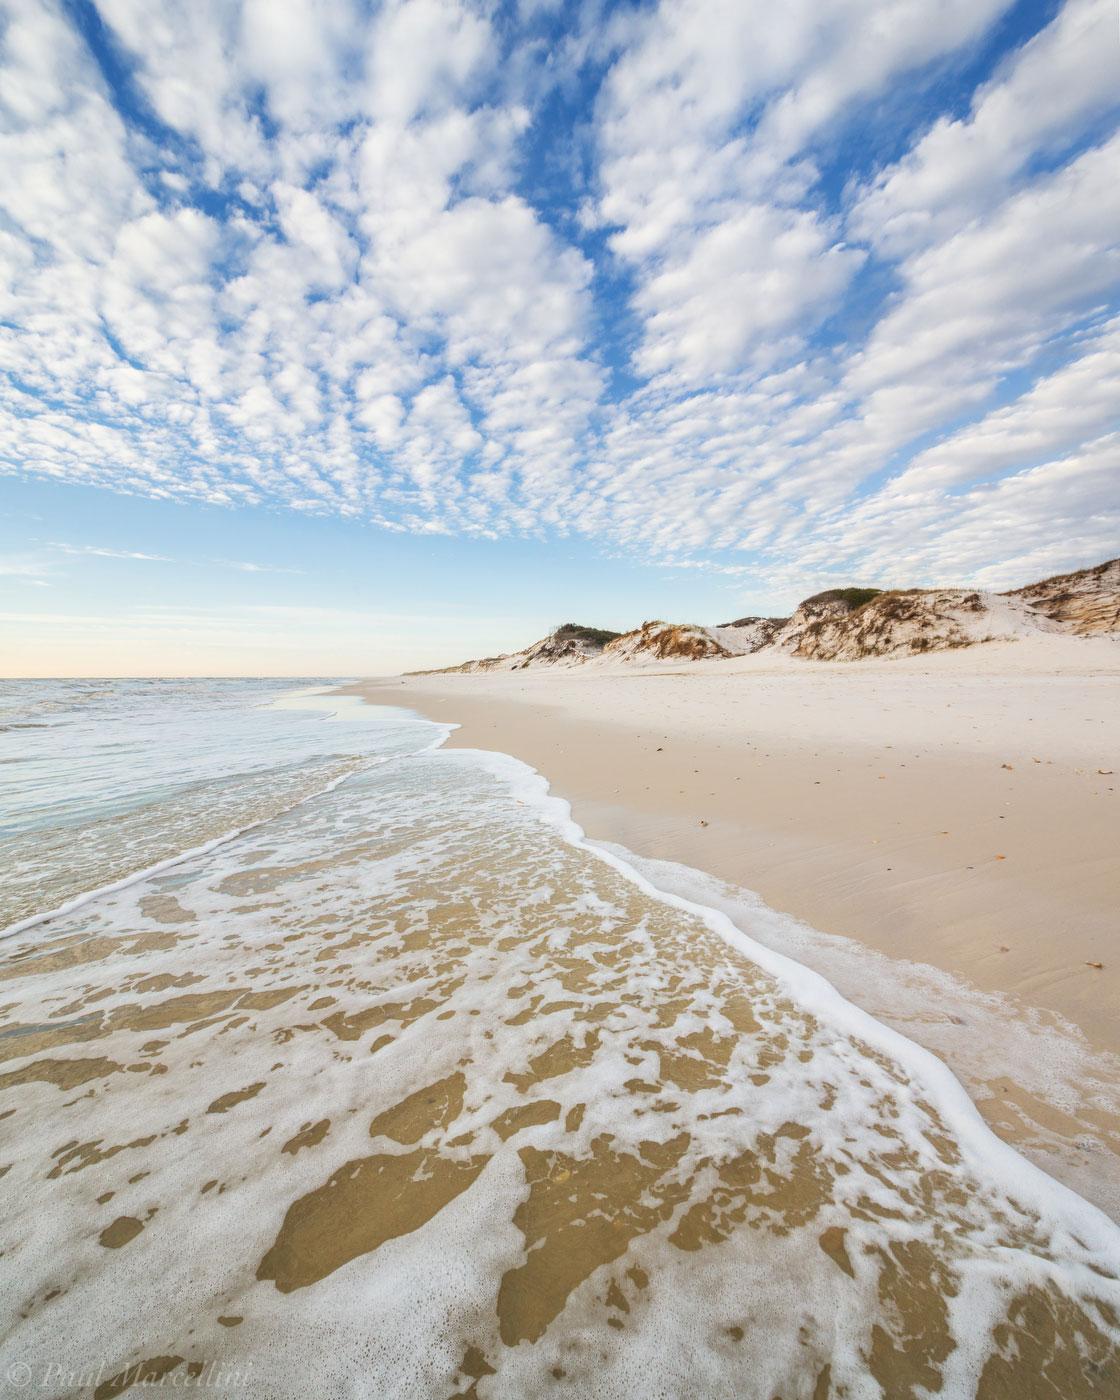 St. Joseph Peninsula State Park, Cape San Blas, Florida, waves, blue, nature, photography, photo